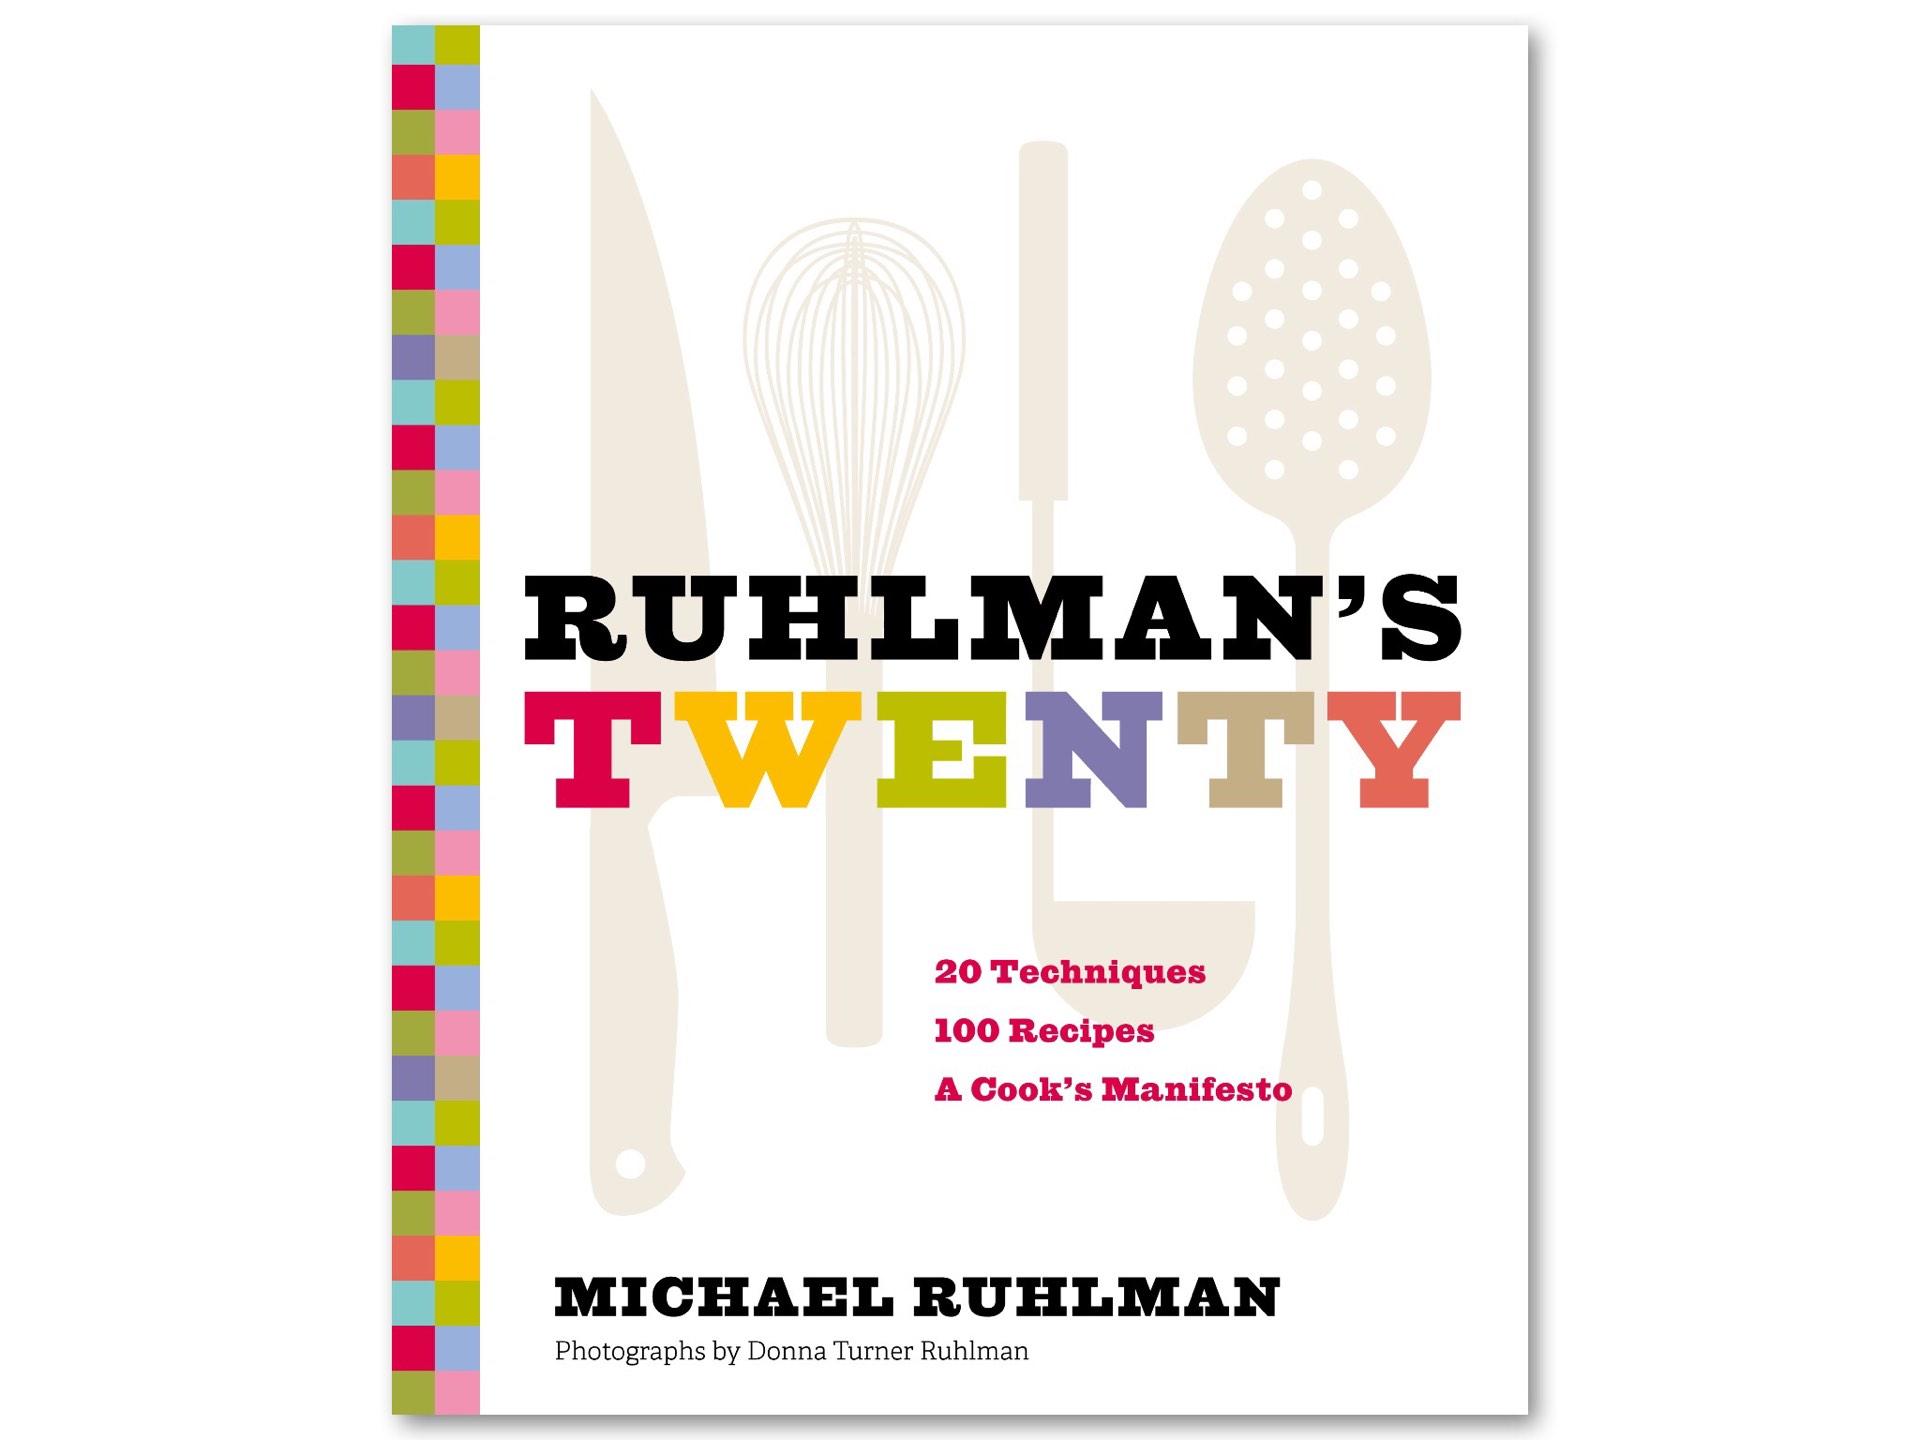 Ruhlman's Twenty cookbook by Michael Ruhlman. ($23 hardcover)